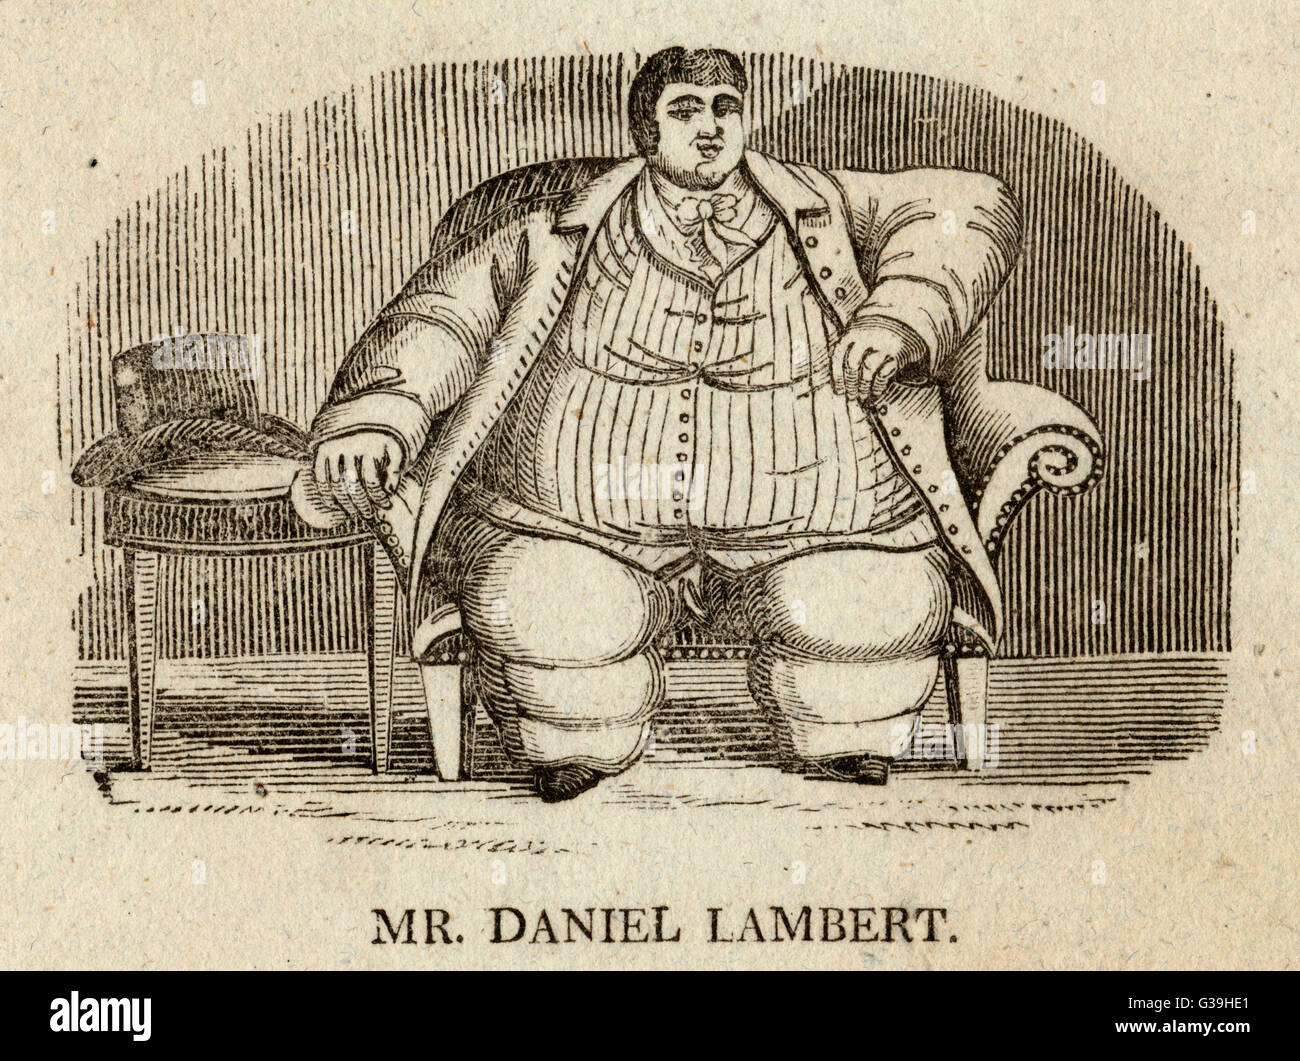 DANIEL LAMBERT fat Englishman        Date: 1770 - 1809 - Stock Image